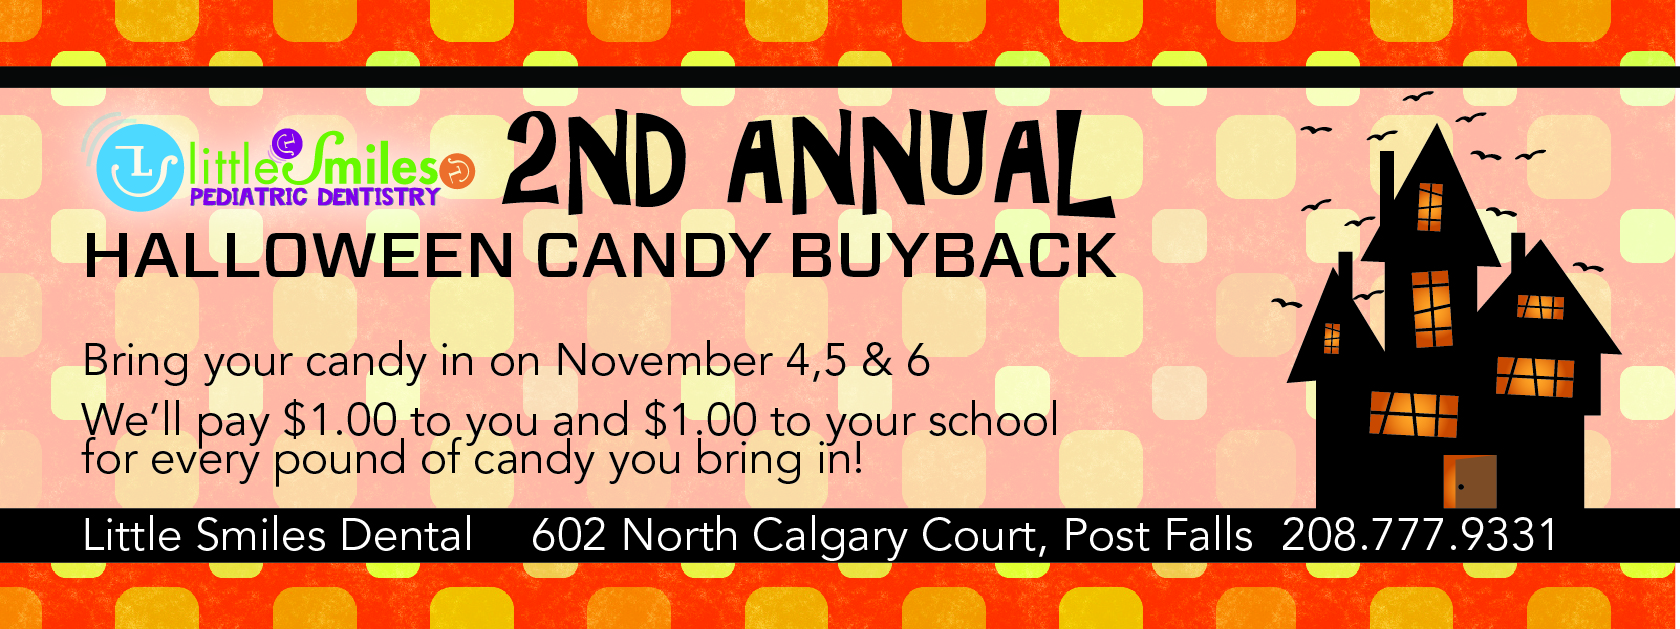 Candy Buy-Back-01-01